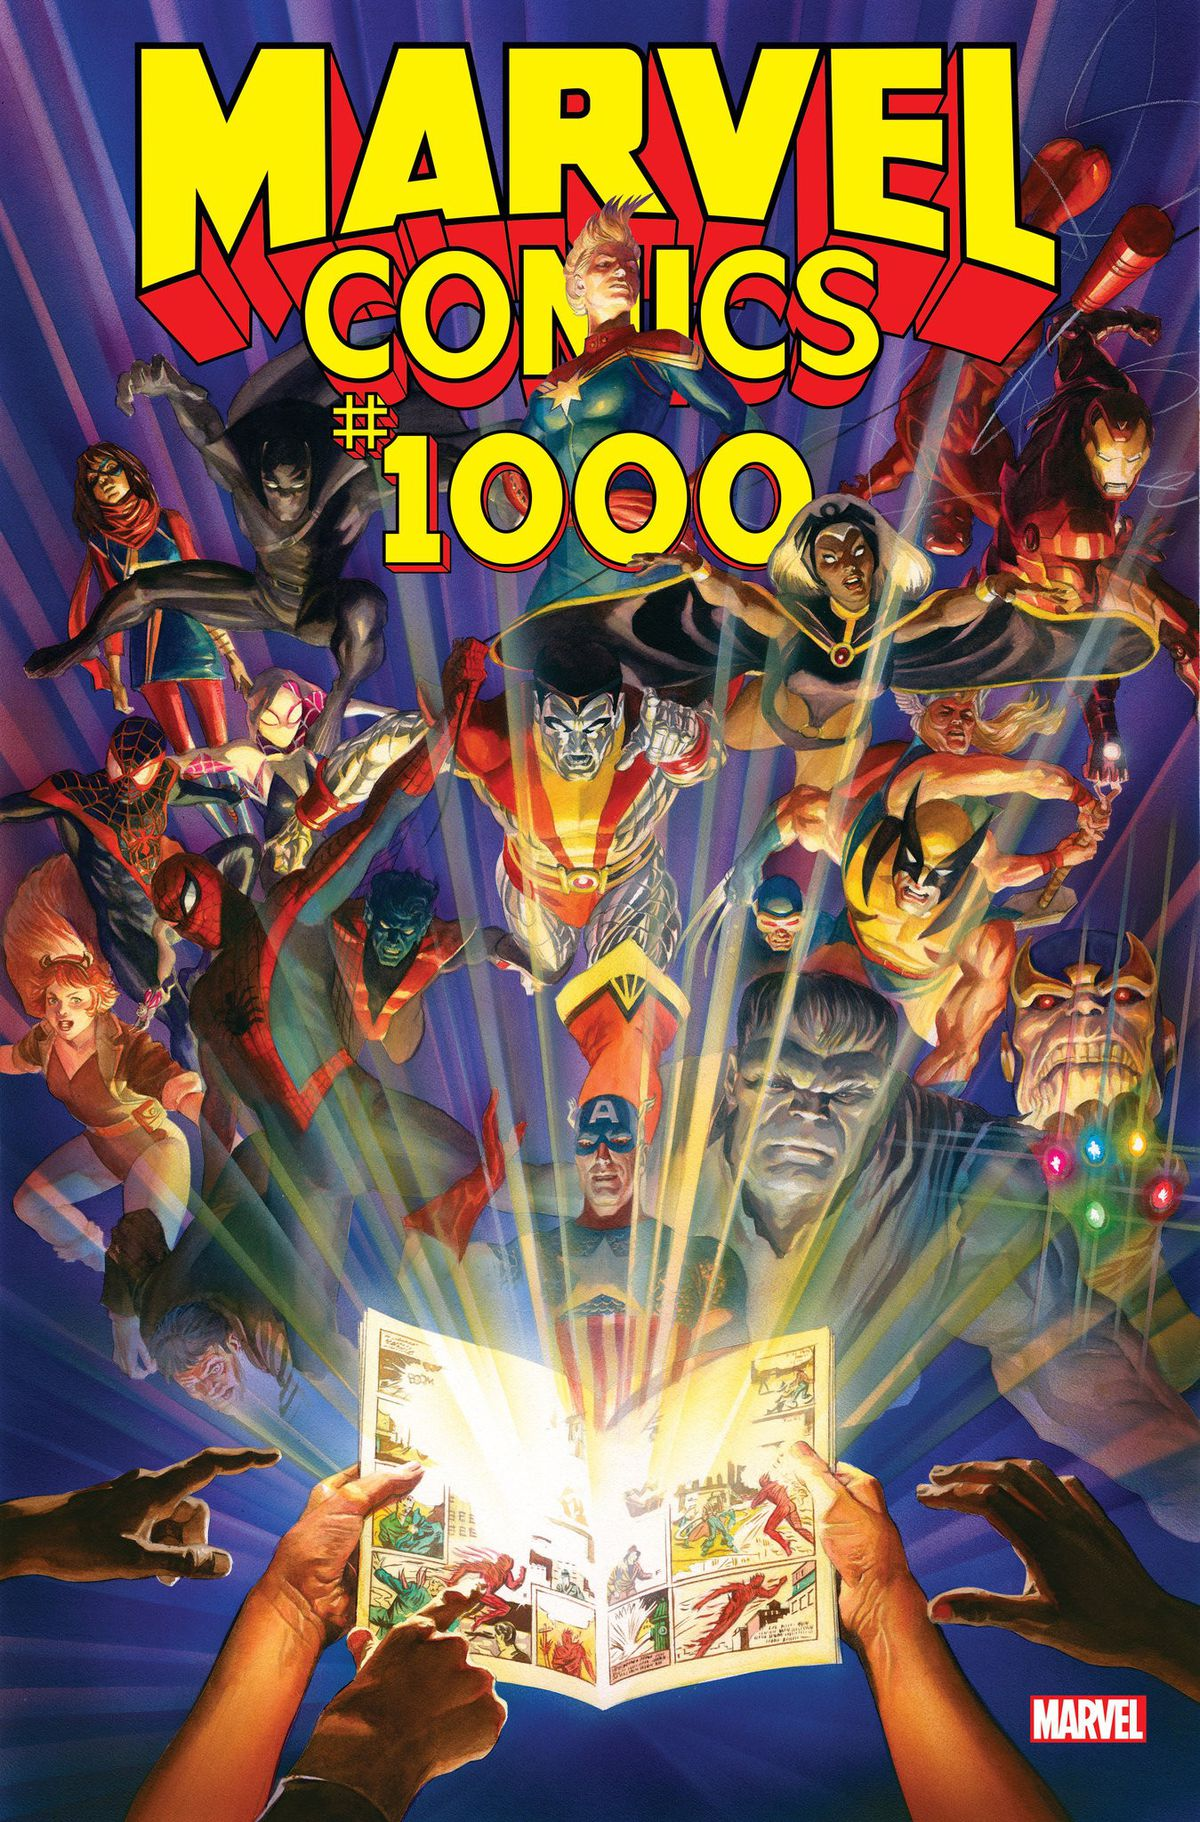 The cover of Marvel Comics #1000, Marvel Comics (2019).